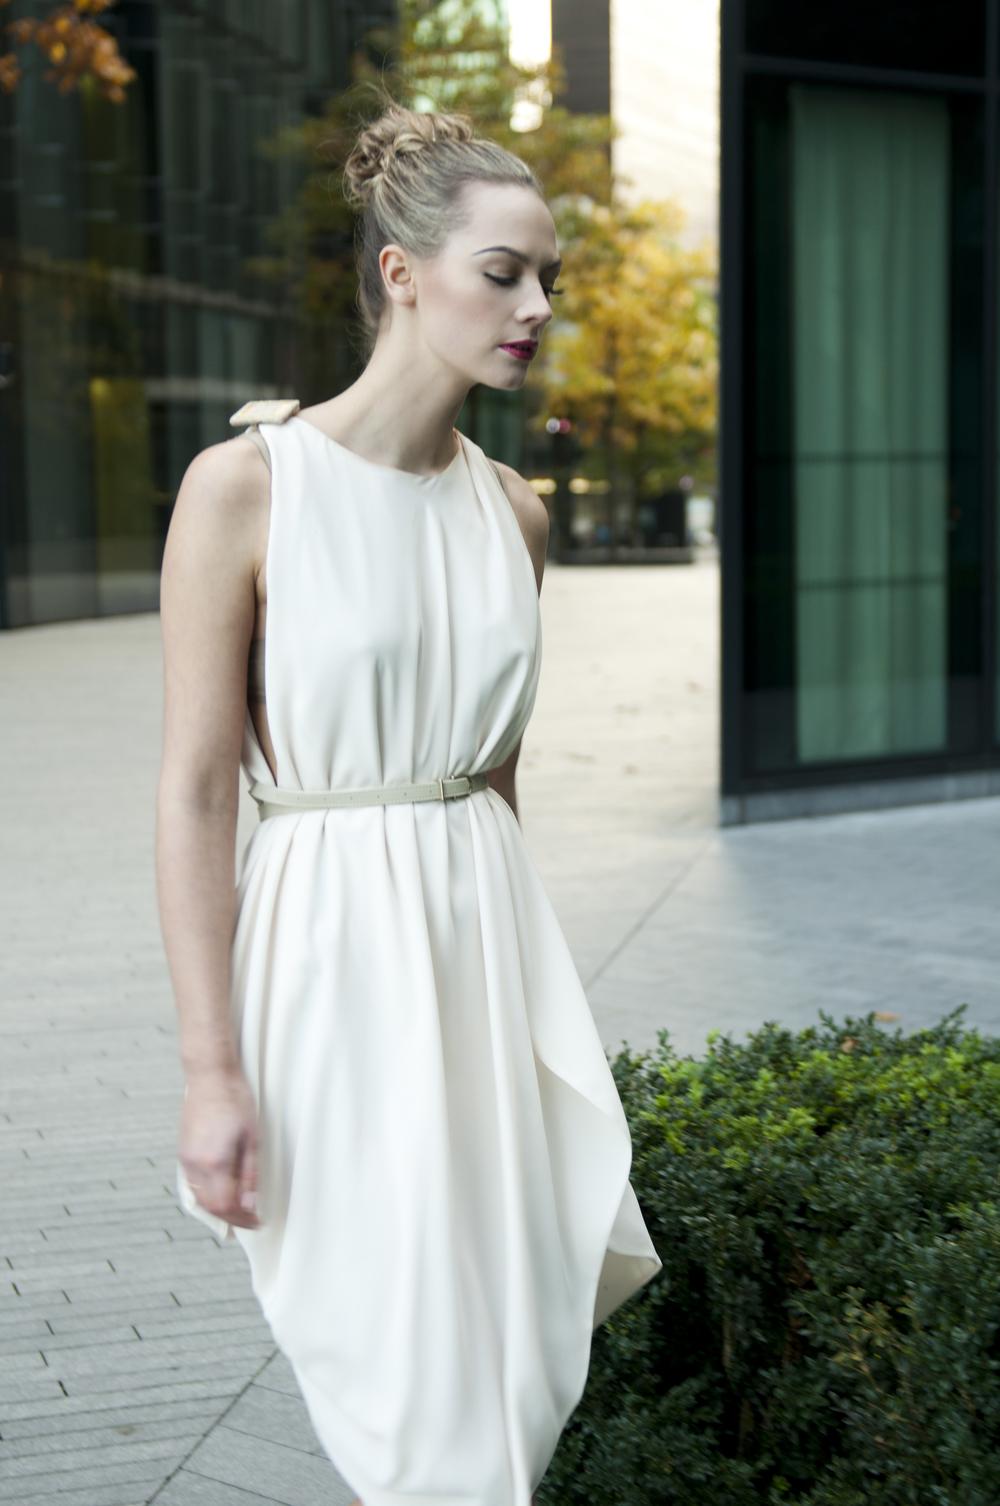 Isabel-wong-rose-white-georgette-memorie-dress-spring-summer-campaign-1.jpg